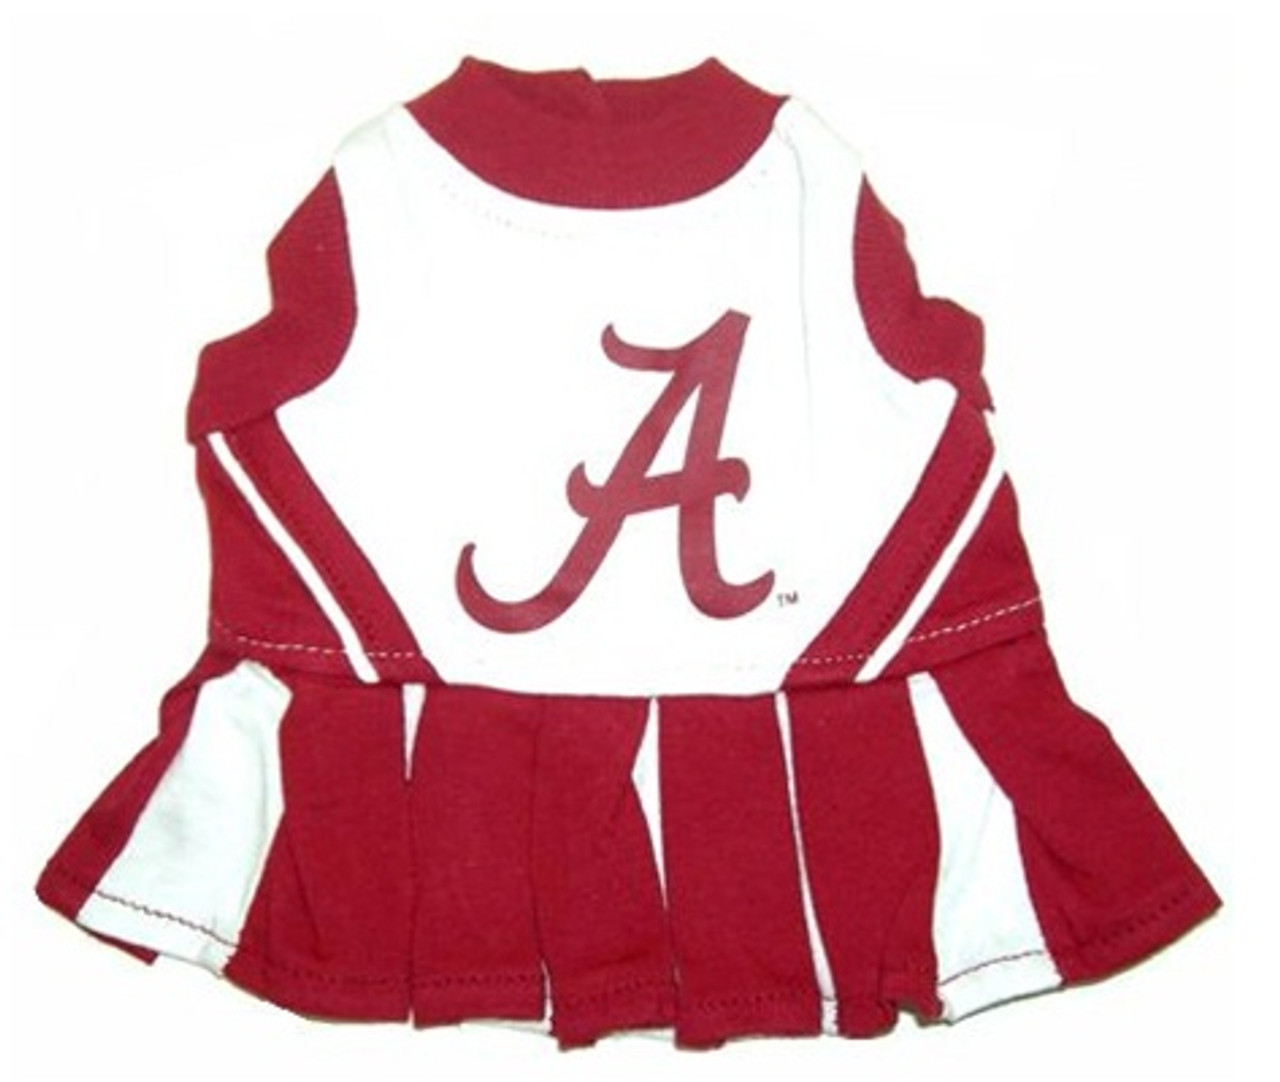 NCAA South Carolina Gamecocks Cheerleader Dog Dress